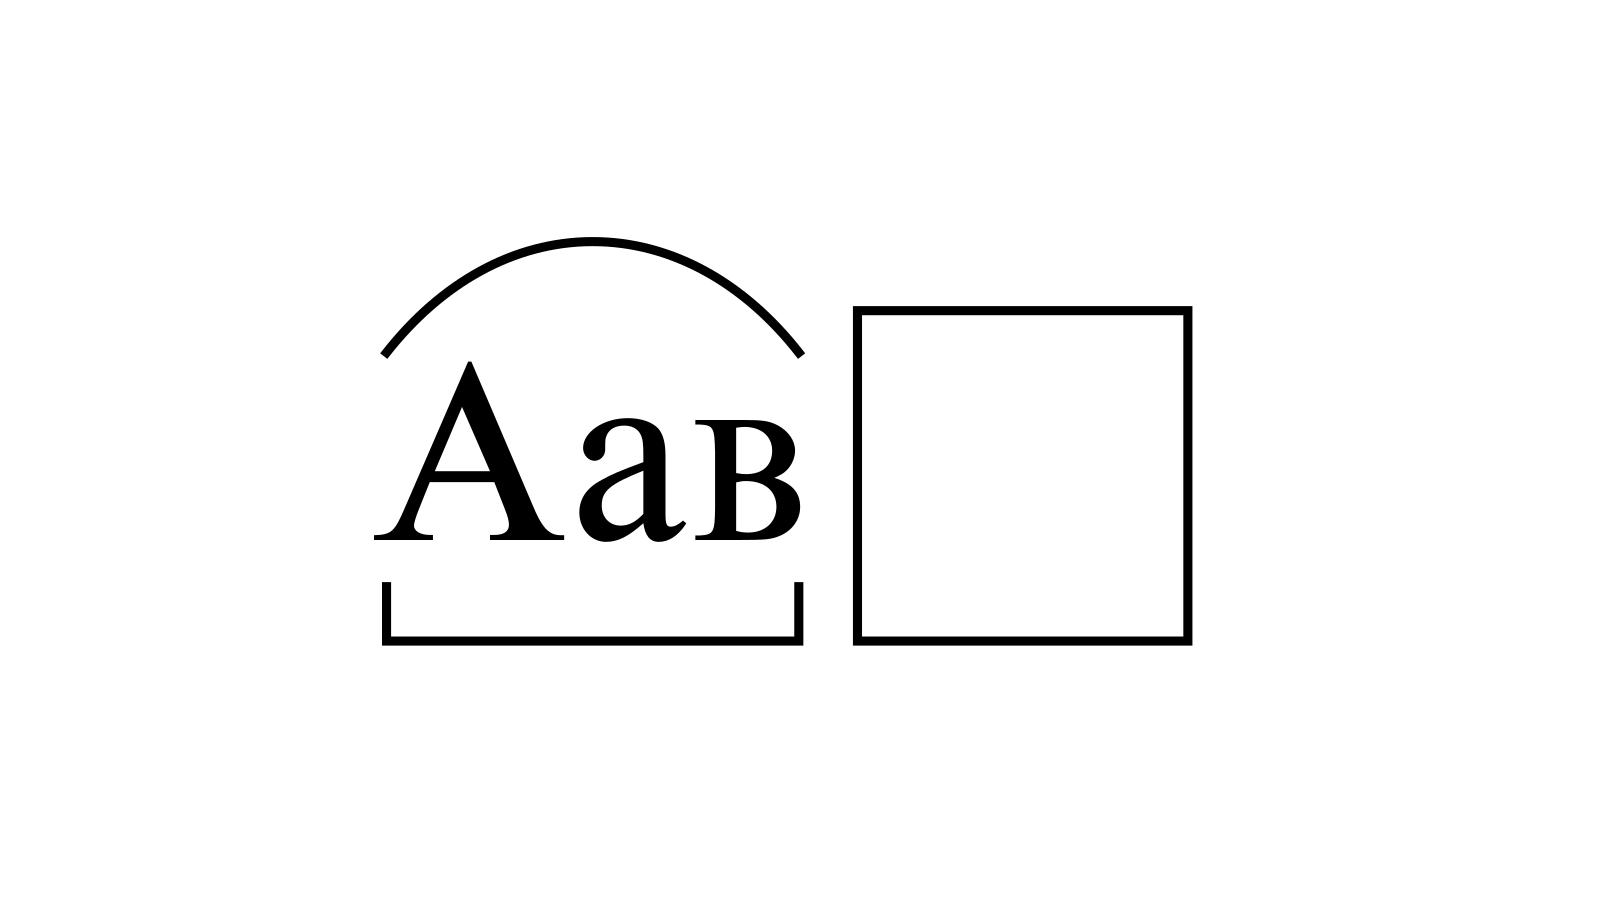 Разбор слова «Аав» по составу